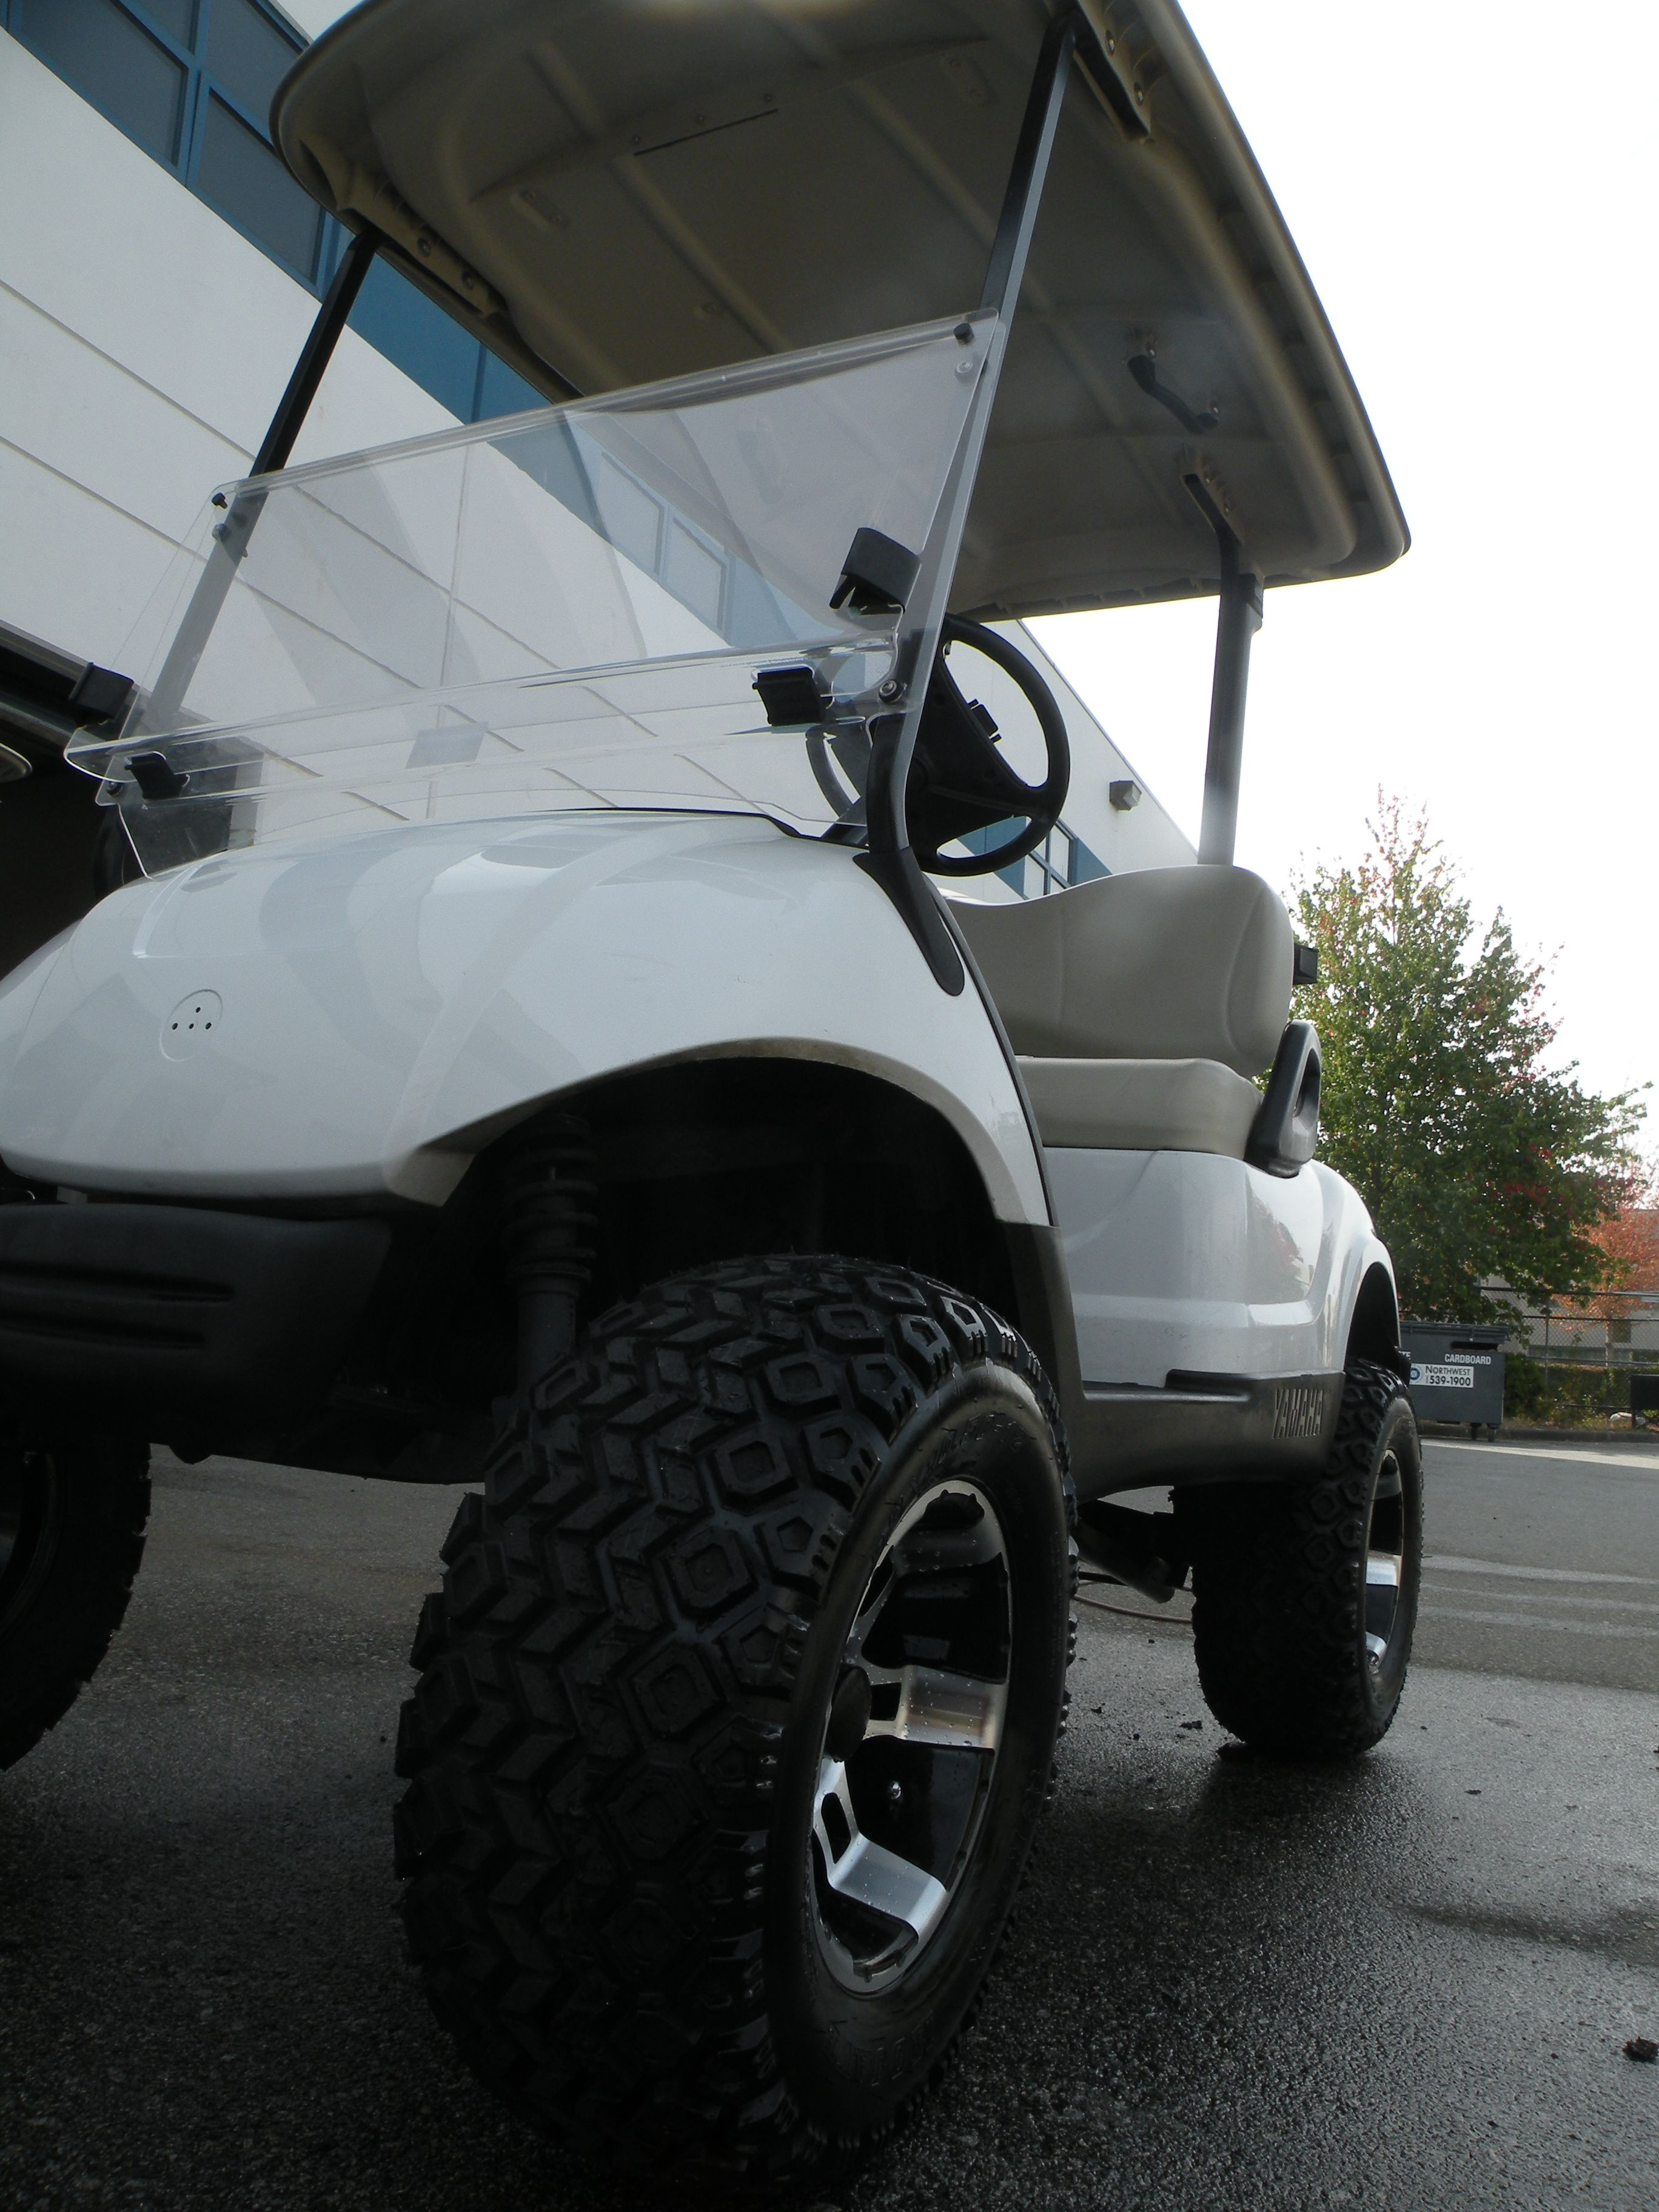 Lift Kit Yamaha Drive Electric 23 6 Golf Golf Cart Lift Kits